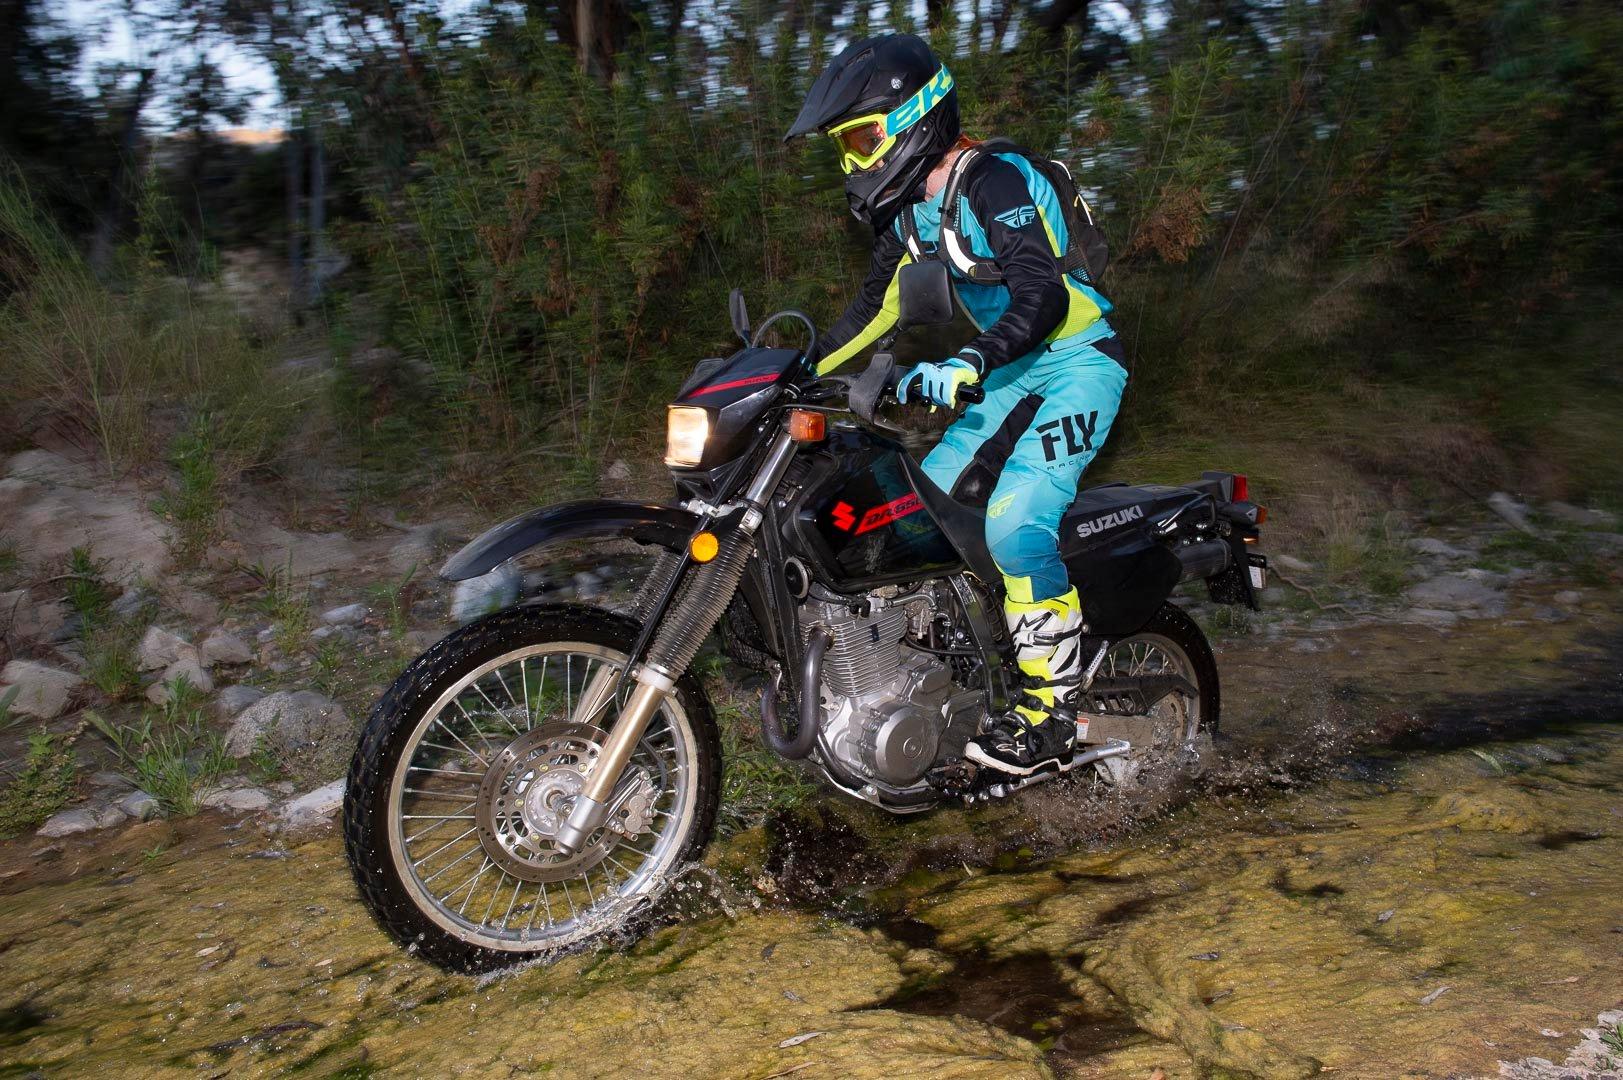 2019 Suzuki DR650S Review - Specs